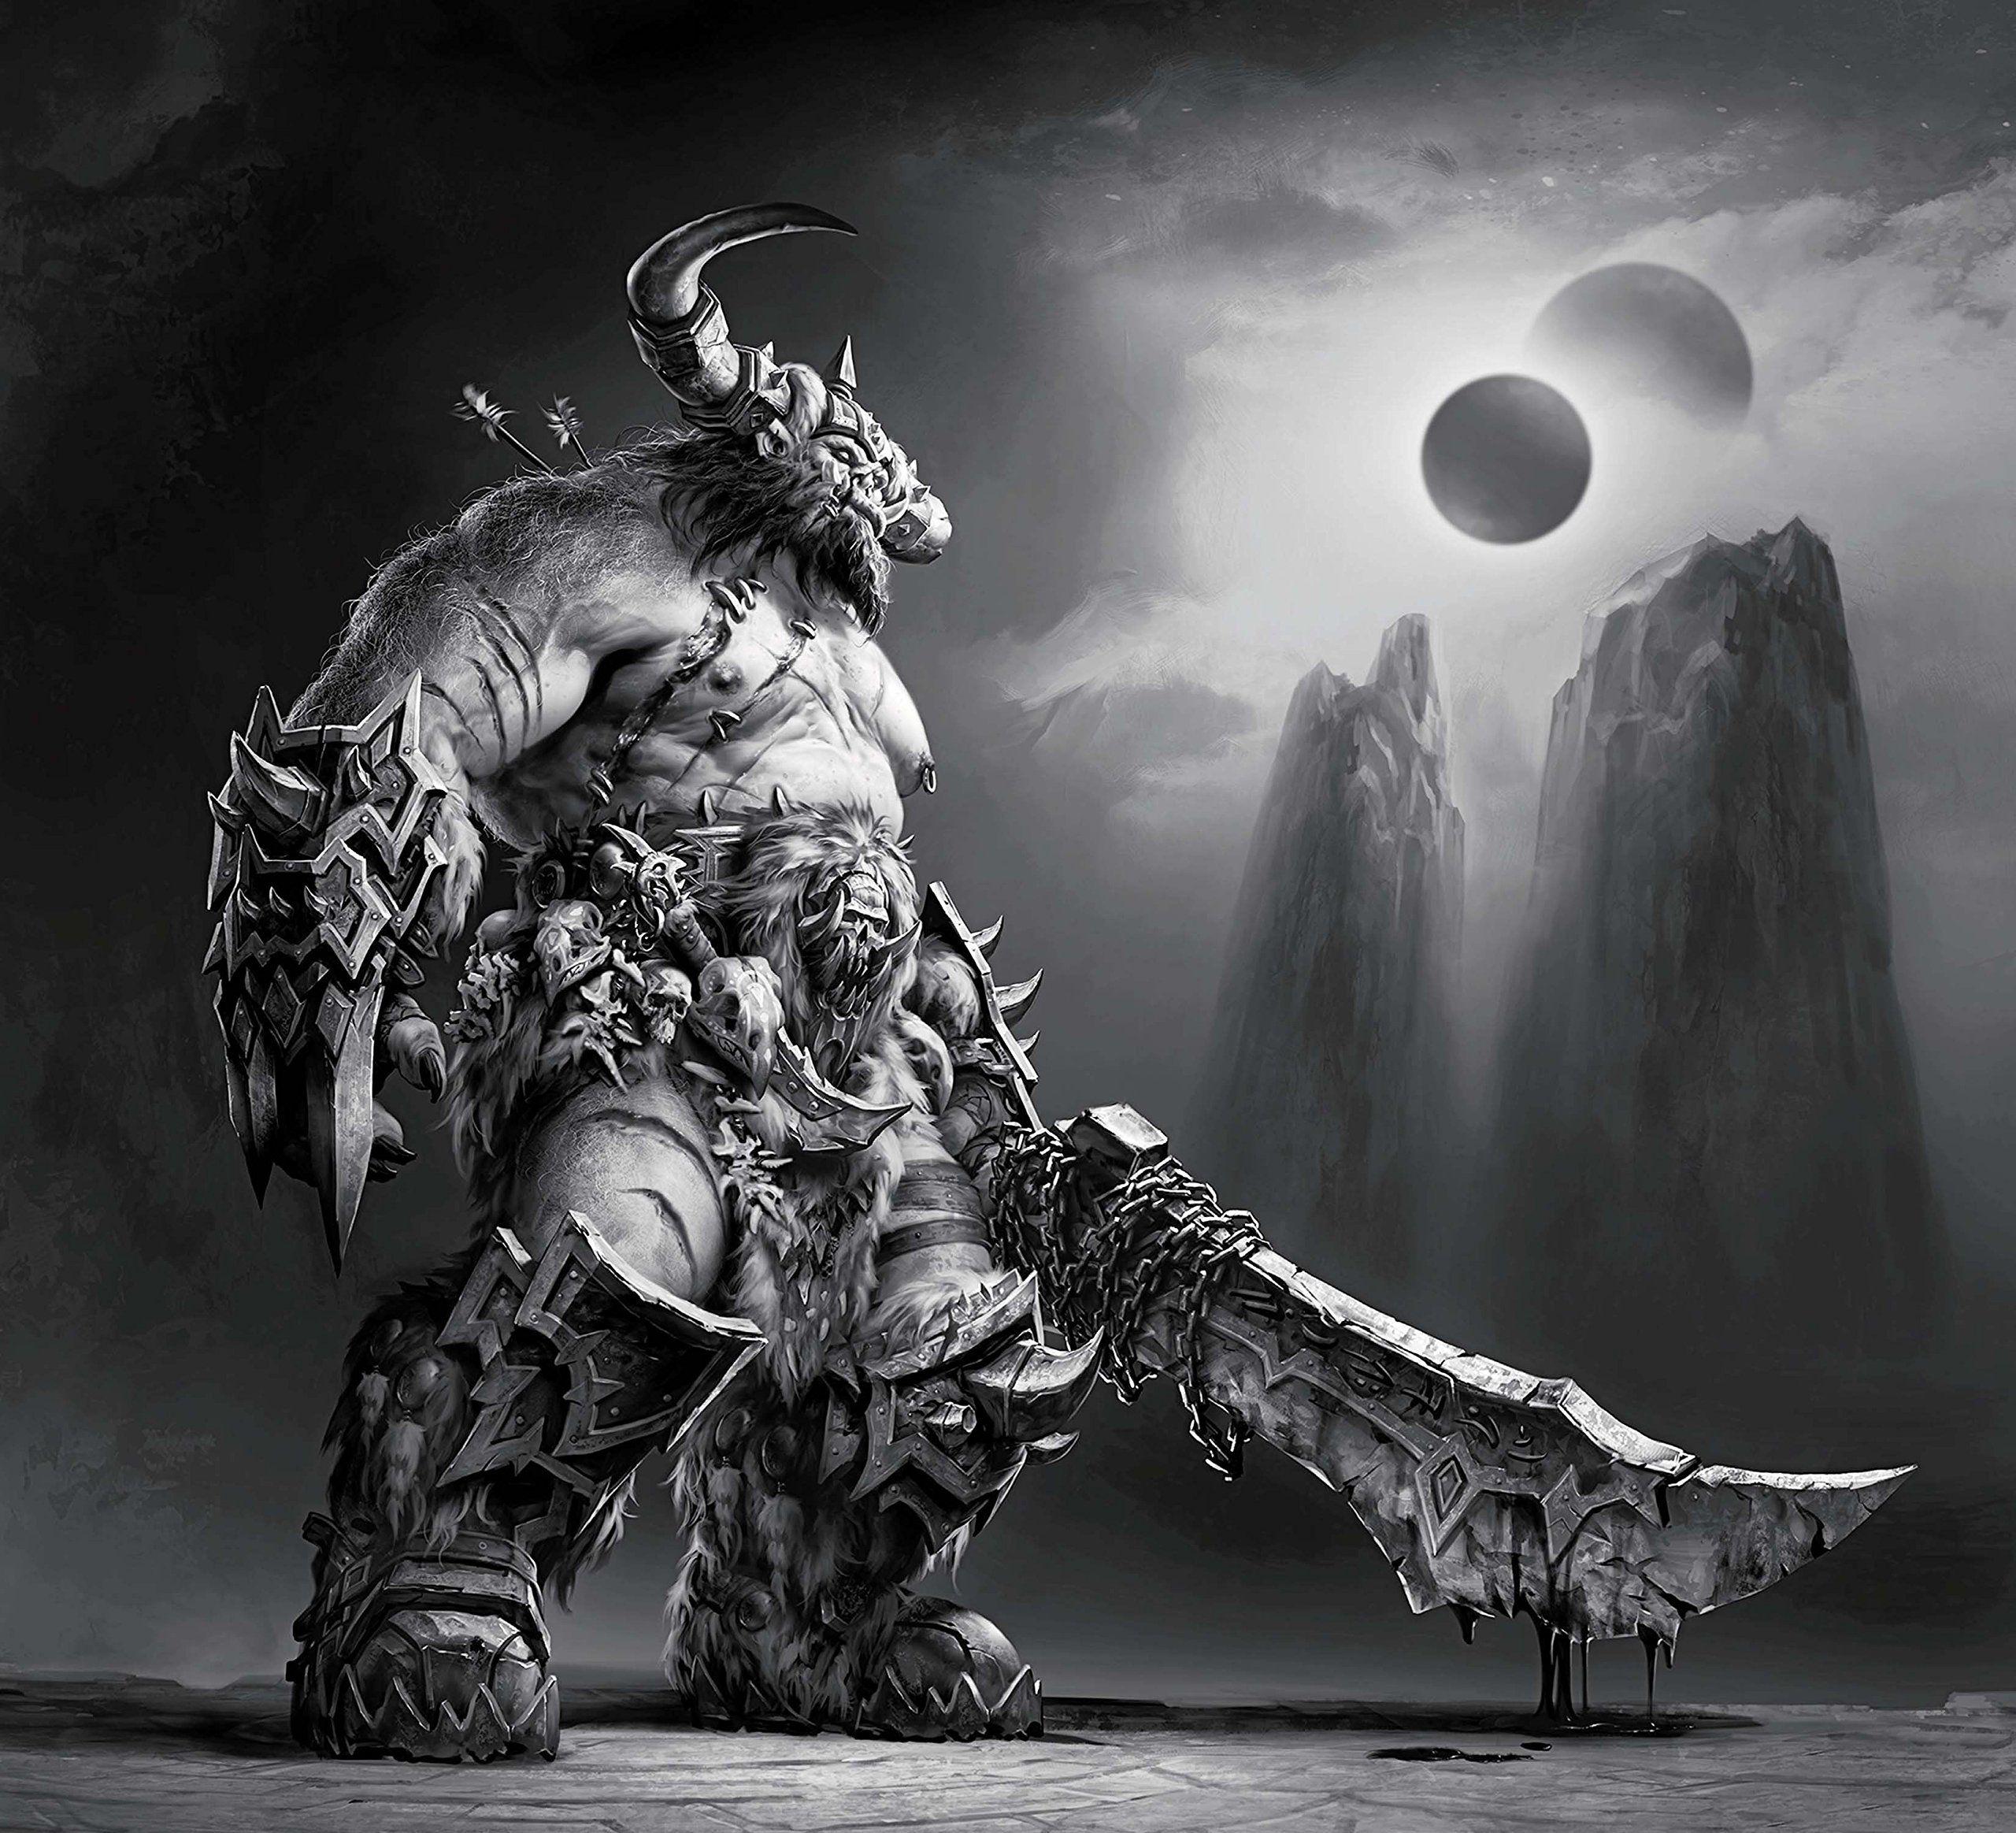 Warcraft Movie Orc Concept Art Criaturas Fantasticas Orcos Warcraft Criaturas De Fantasia